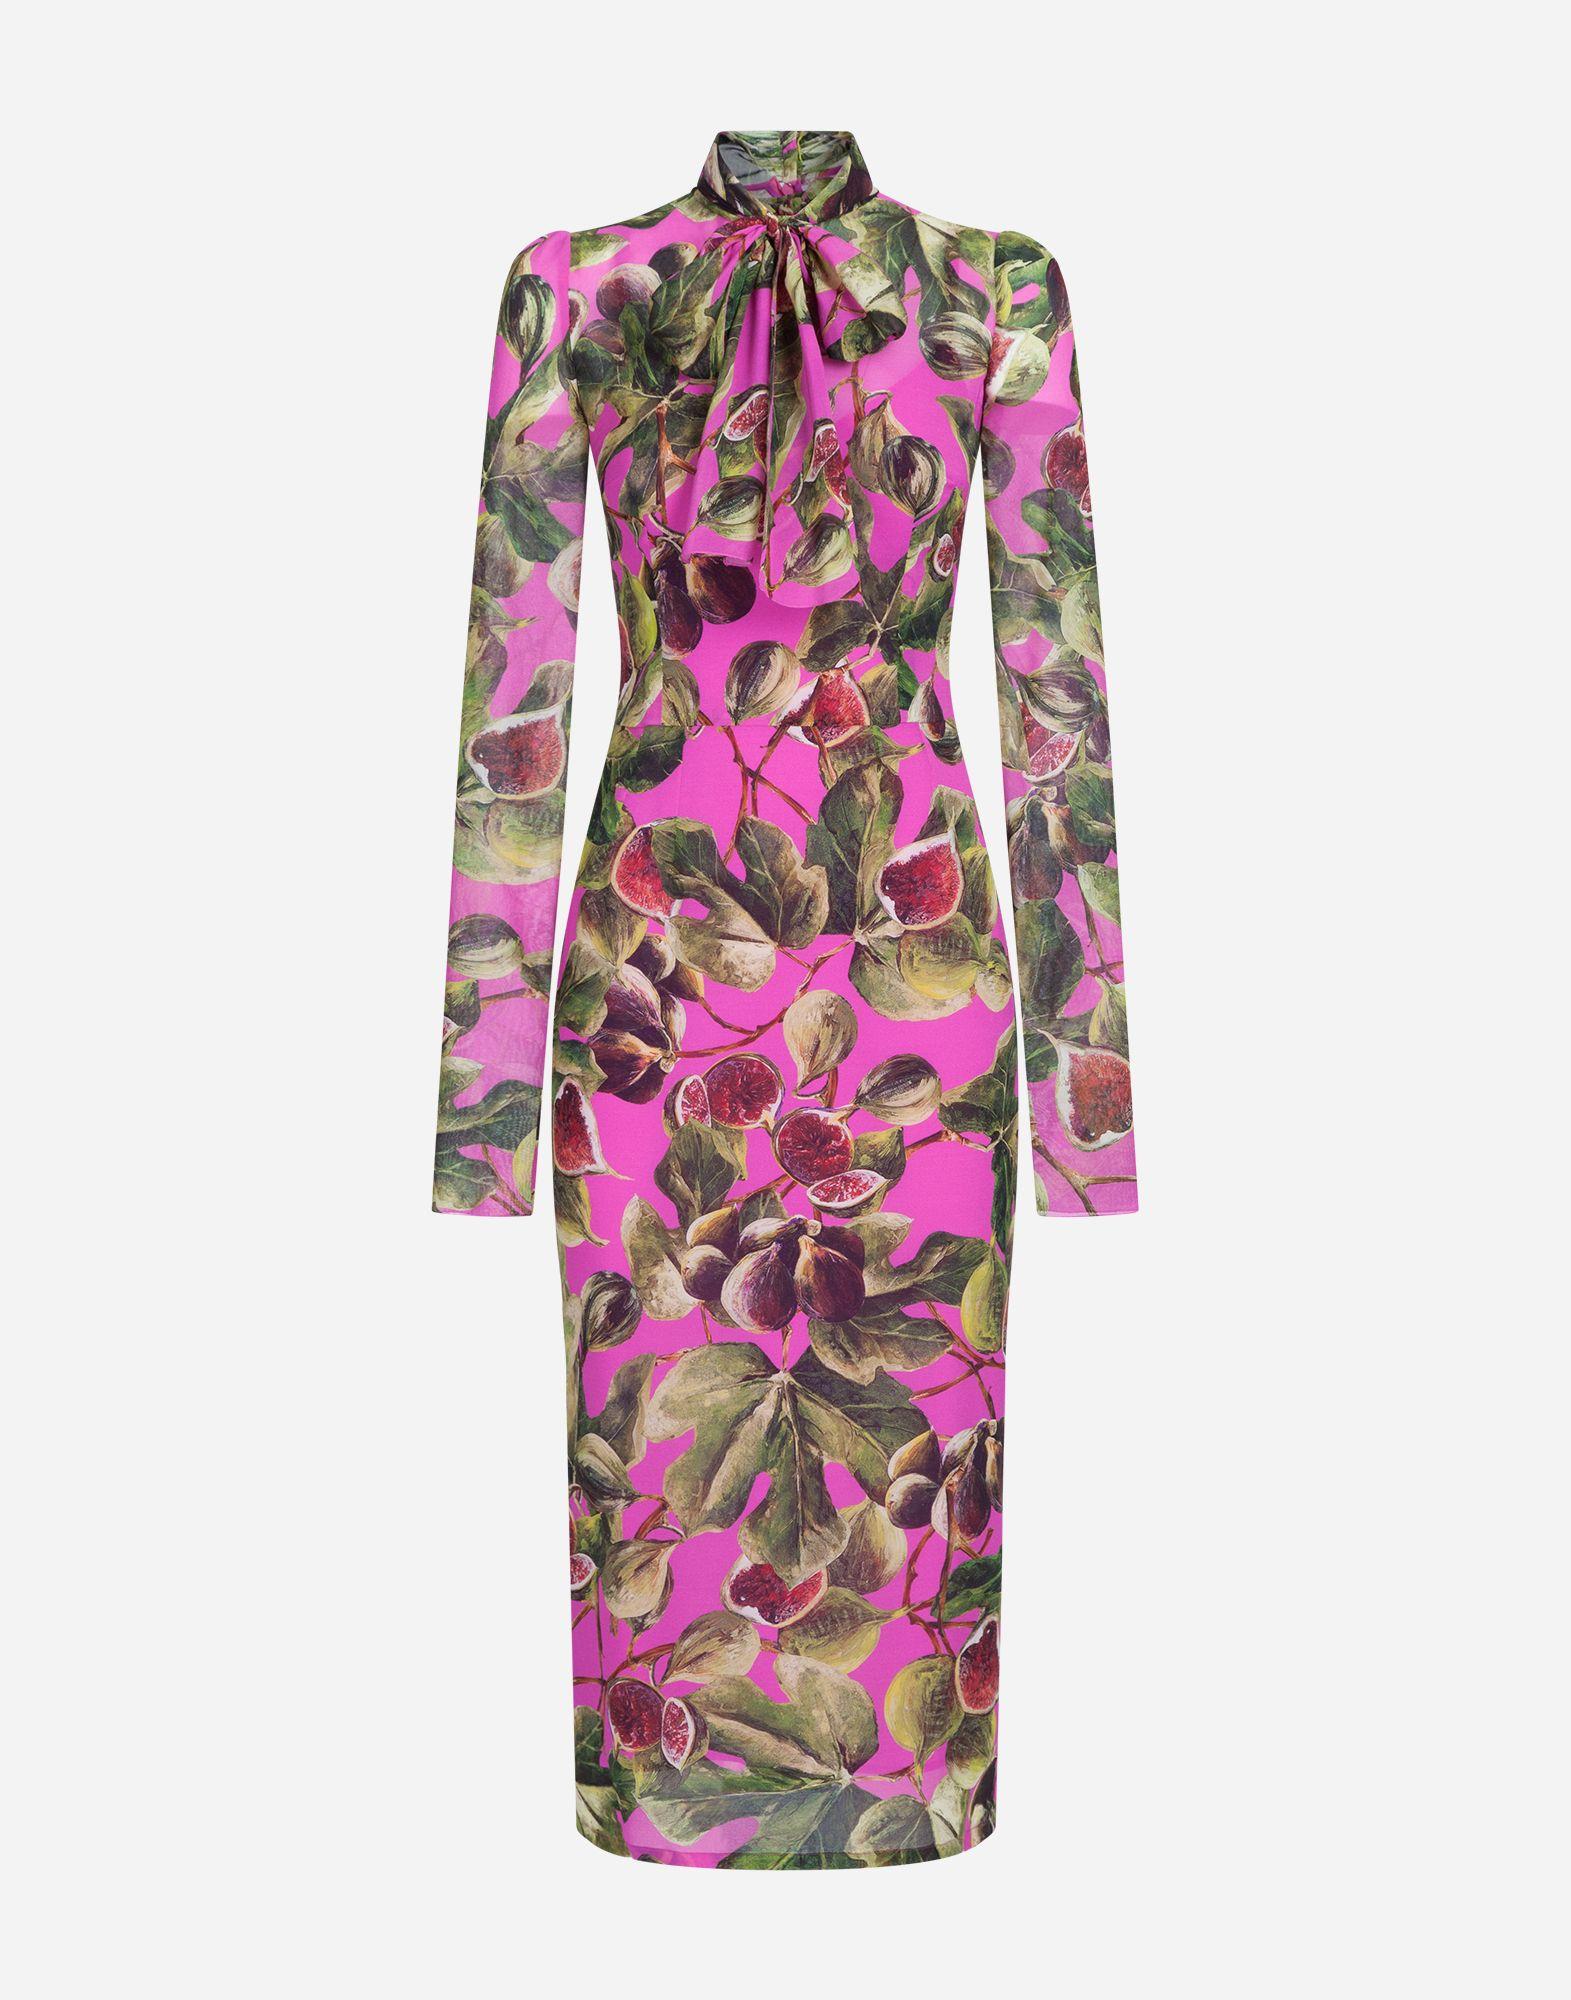 6a7757e0 Dolce & Gabbana - Fig-print fuchsia silk dress ($2,375) | Dresses ...